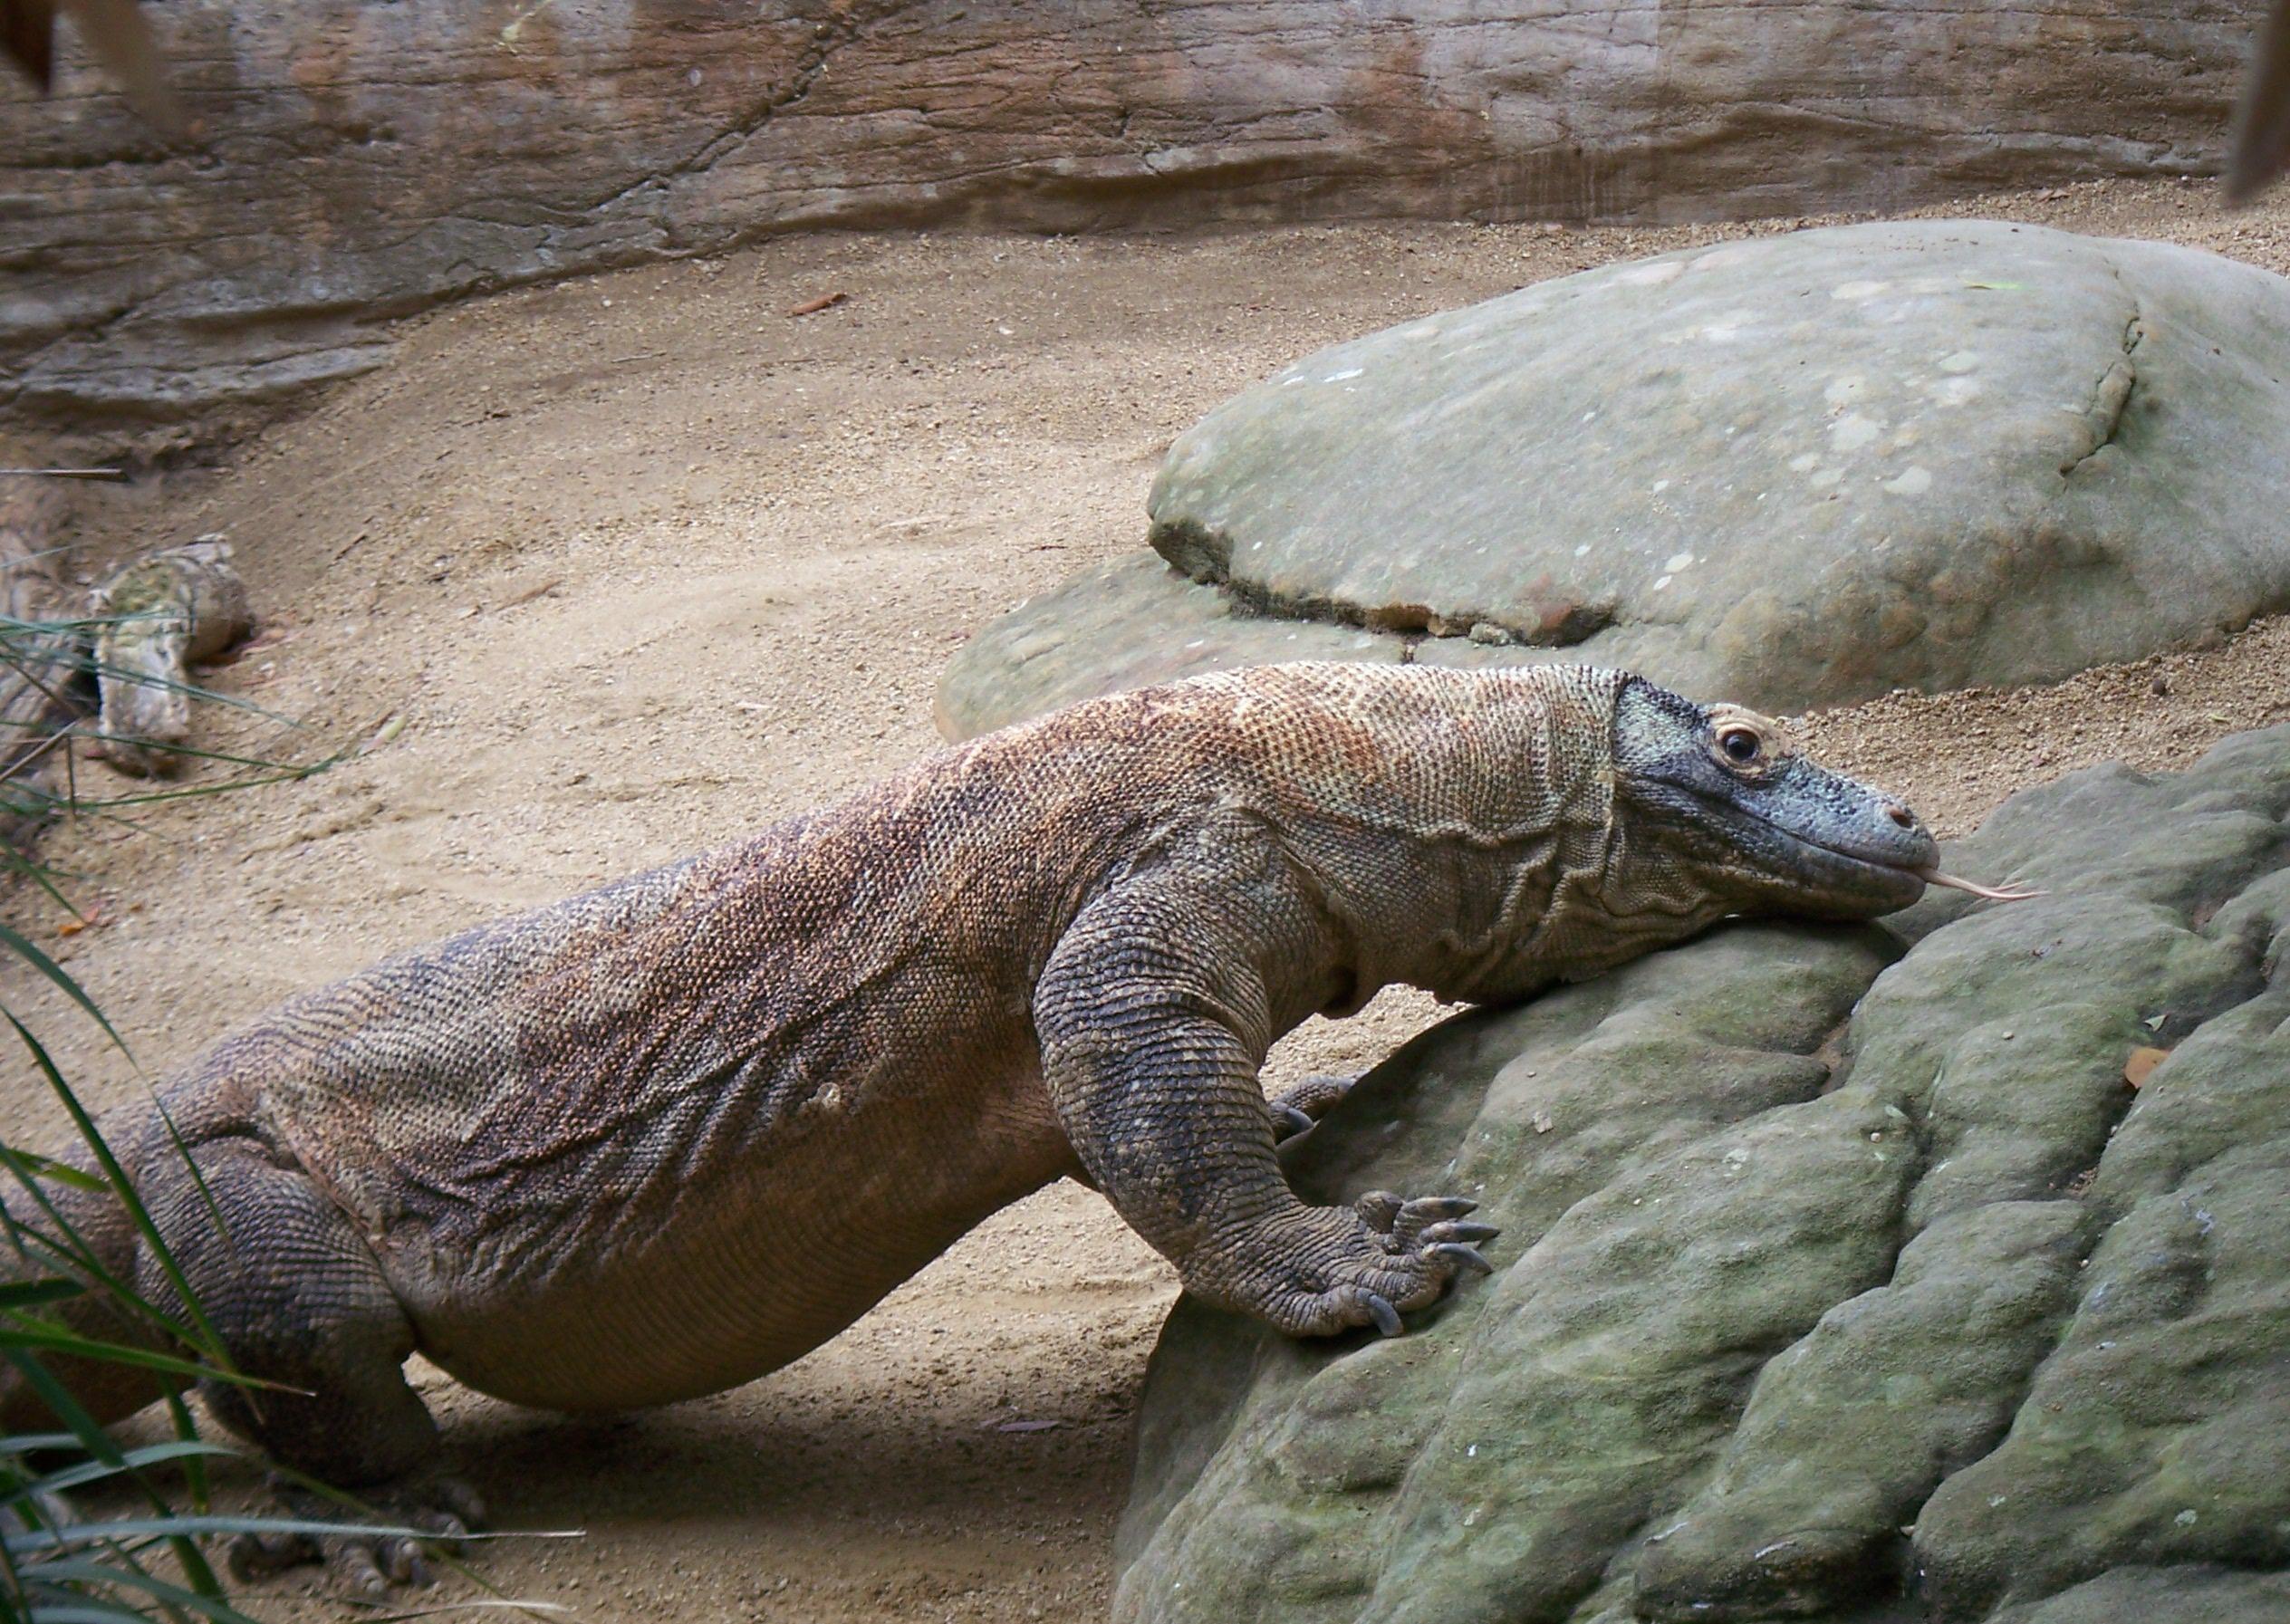 Komodo drakons